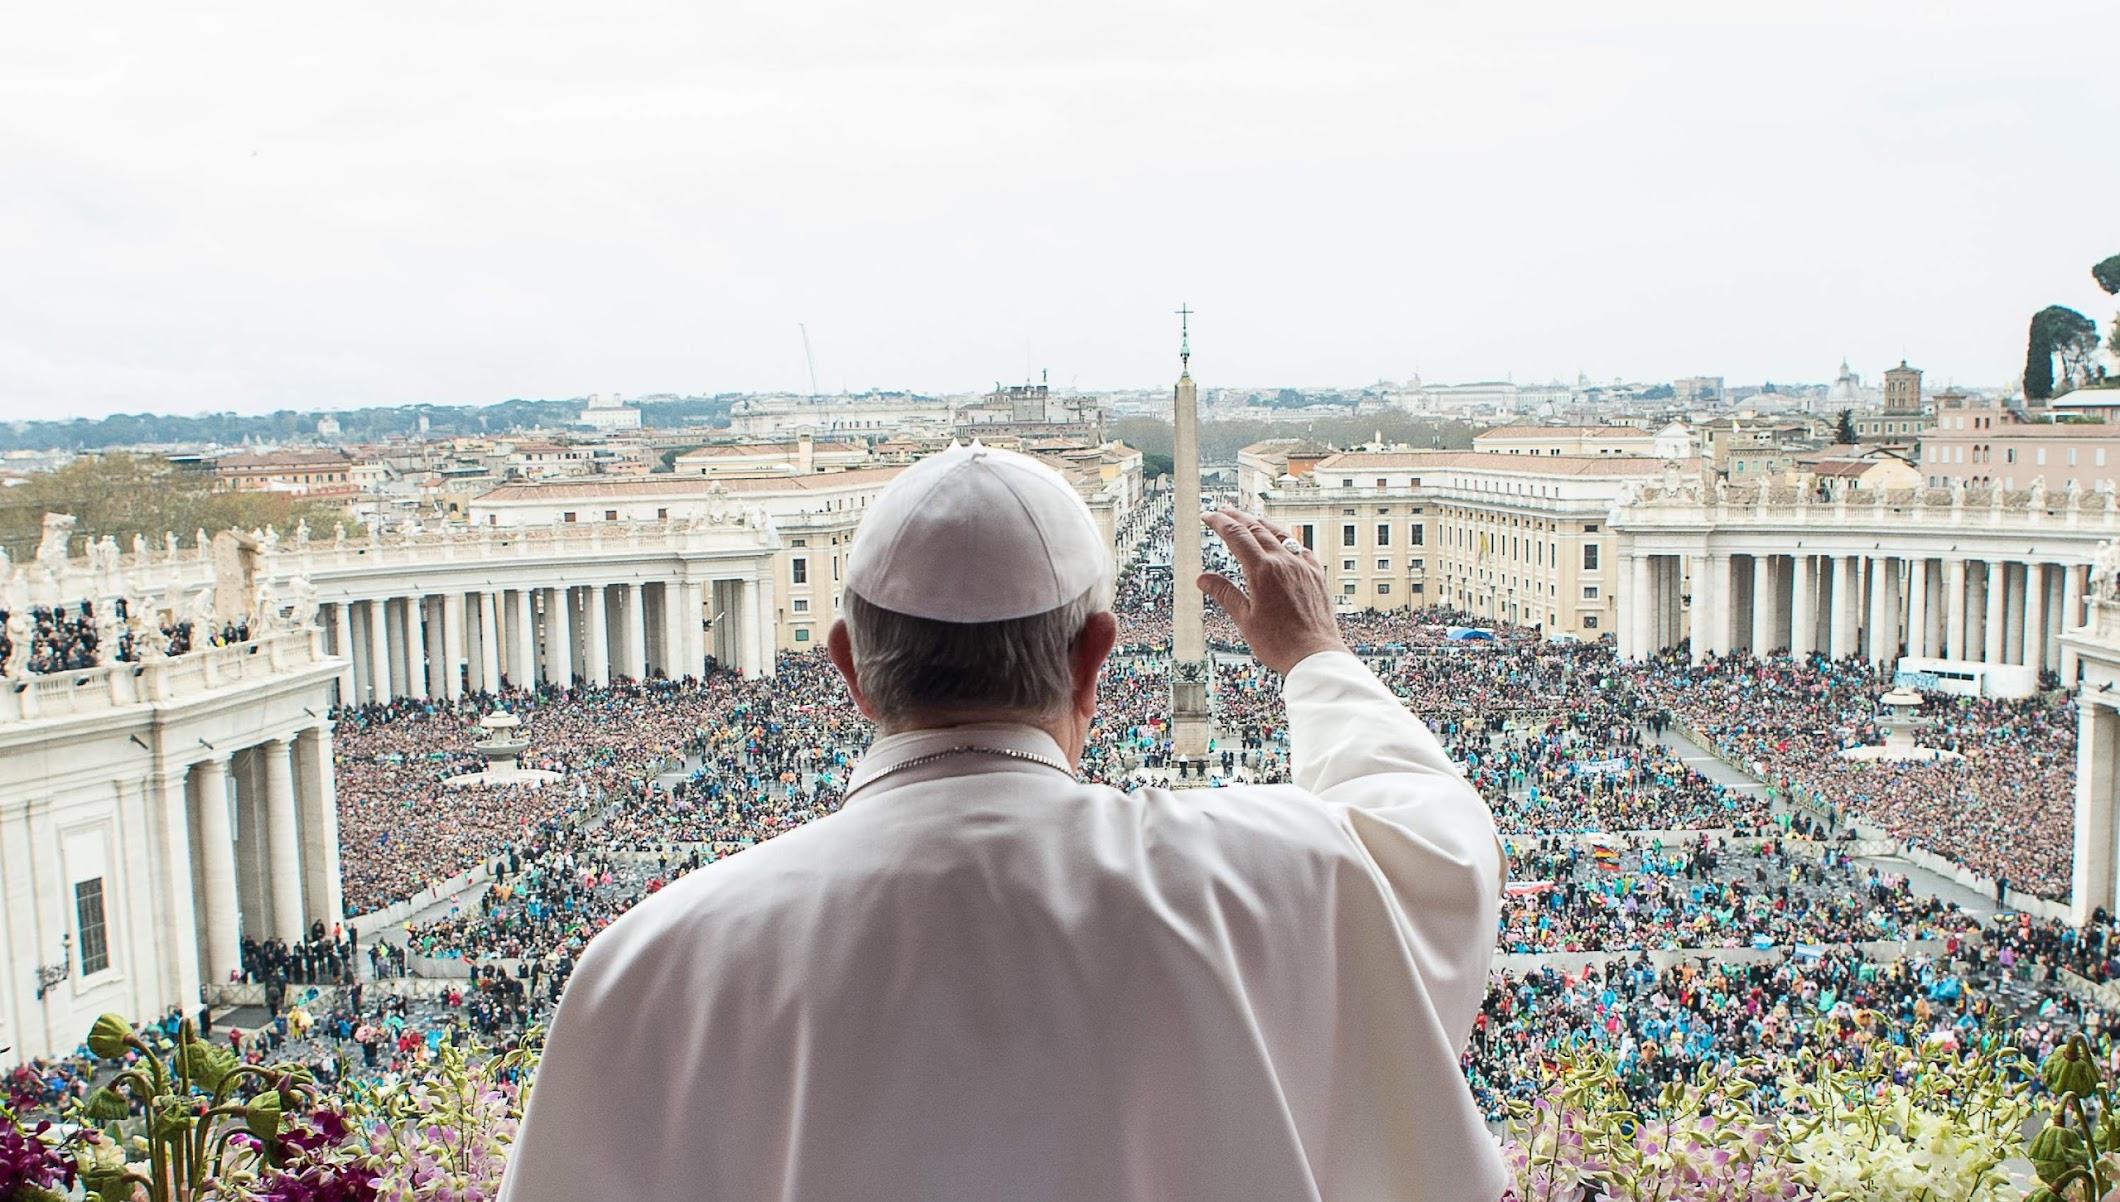 catholicnewsagency